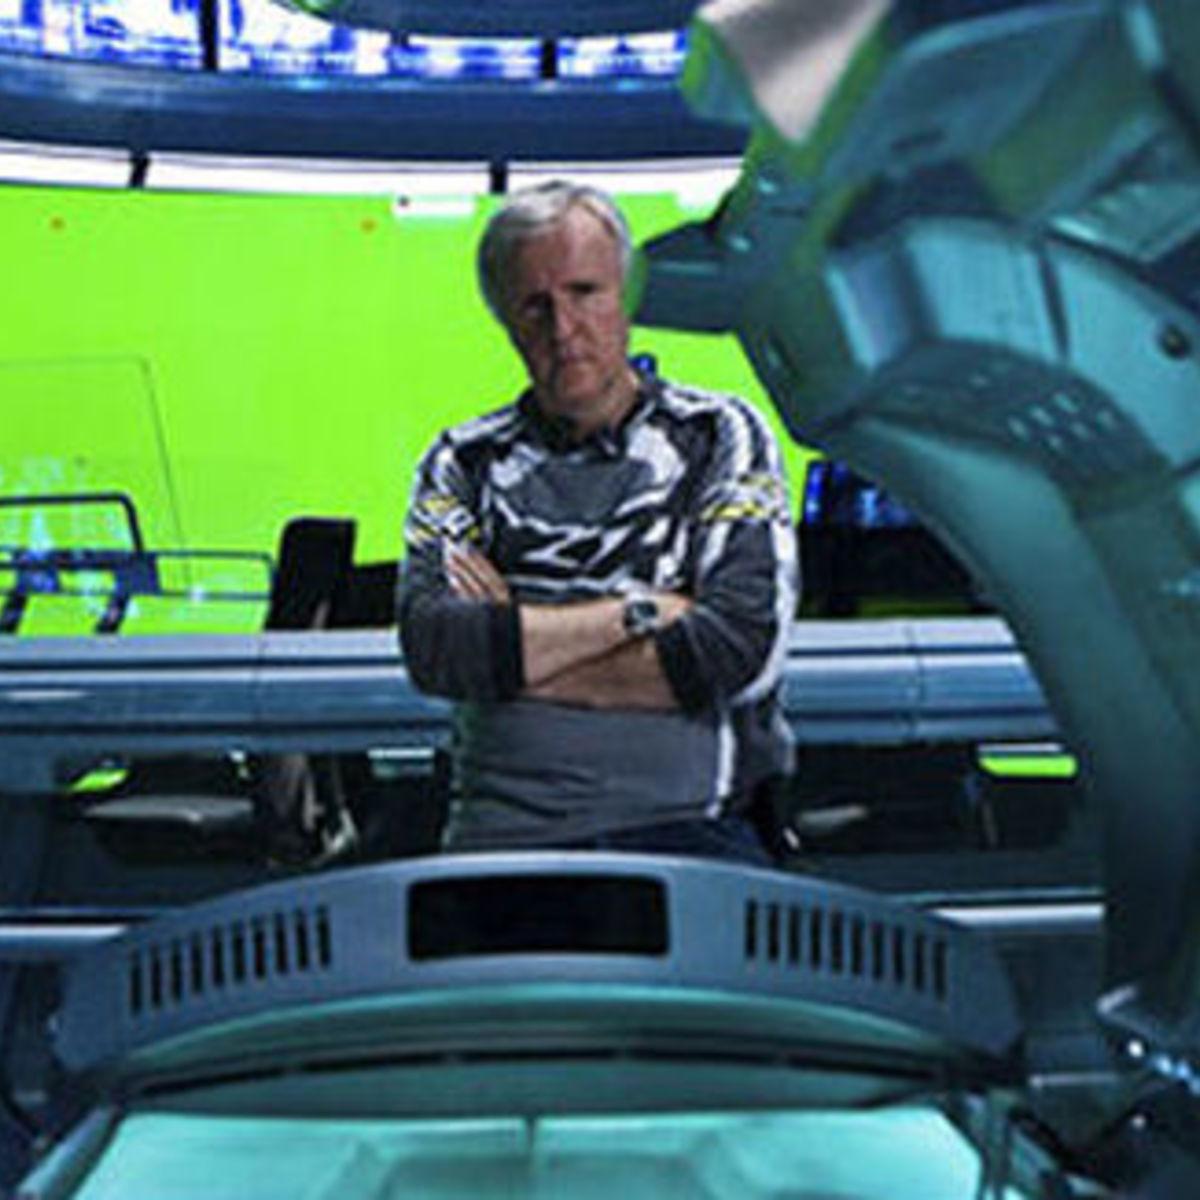 Avatar_JamesCameron_small_3.jpg